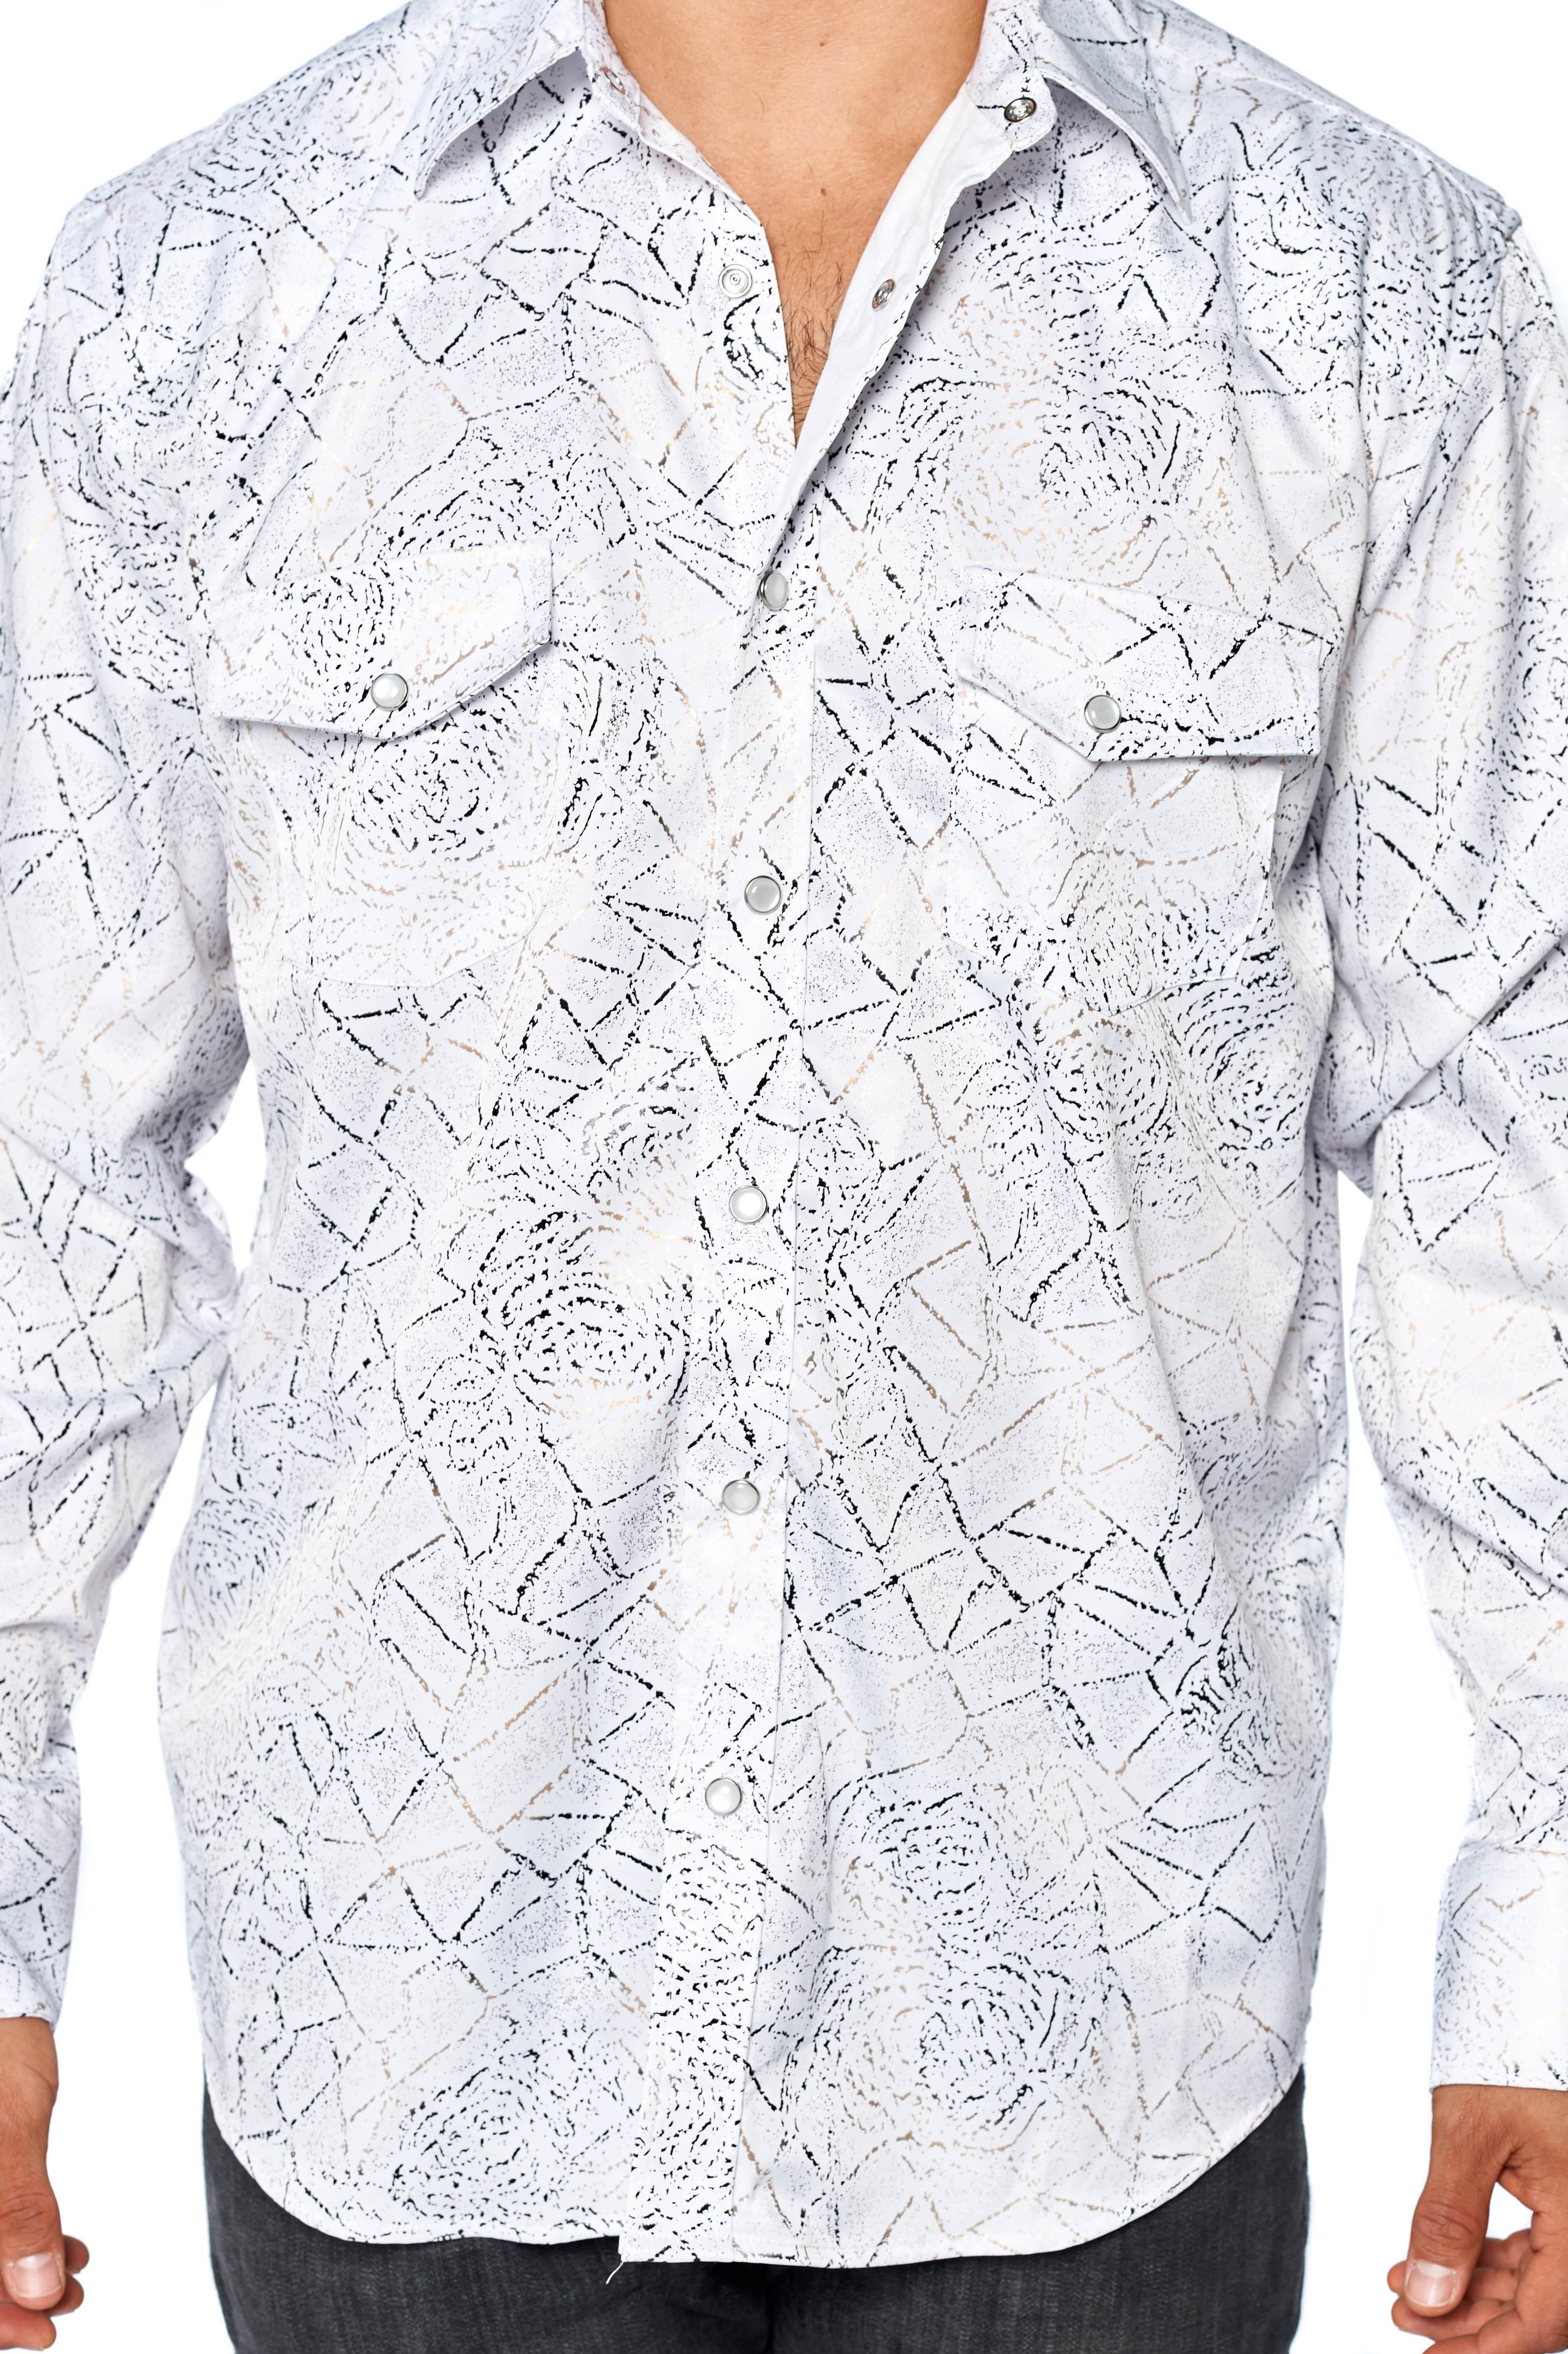 LW-Men-039-s-Pearl-Snap-Tribal-Stylish-Printed-Woven-Western-Vaquero-Rodeo-Shirt thumbnail 14